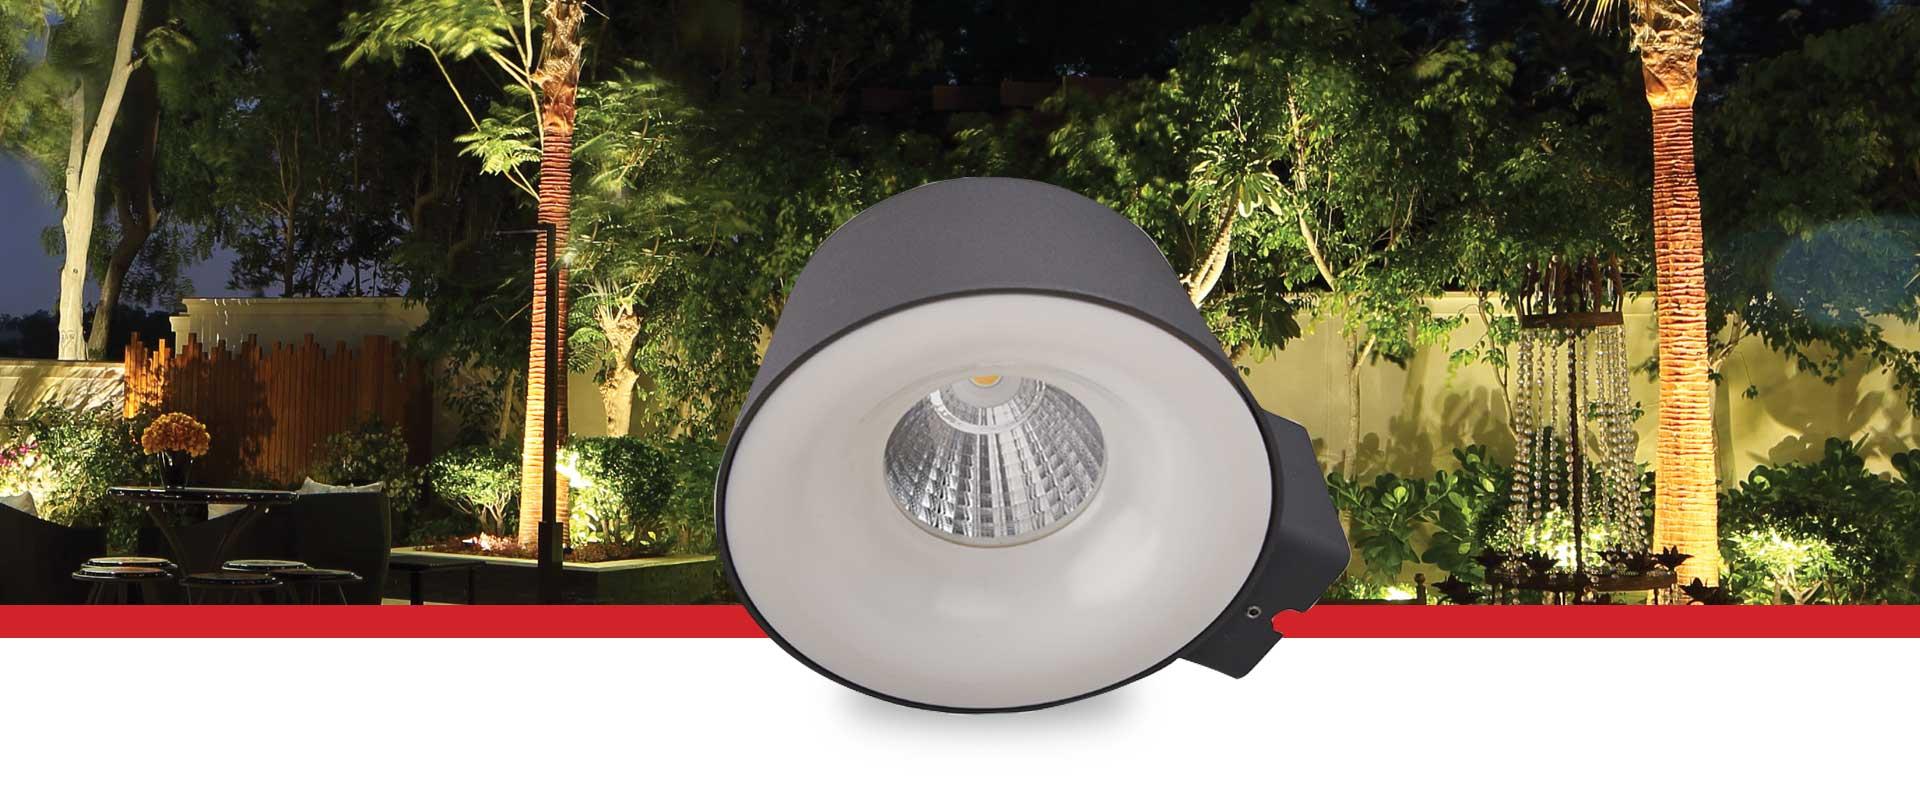 ECI Lighting | Prelux Hamlet LED Outdoor Wall Light